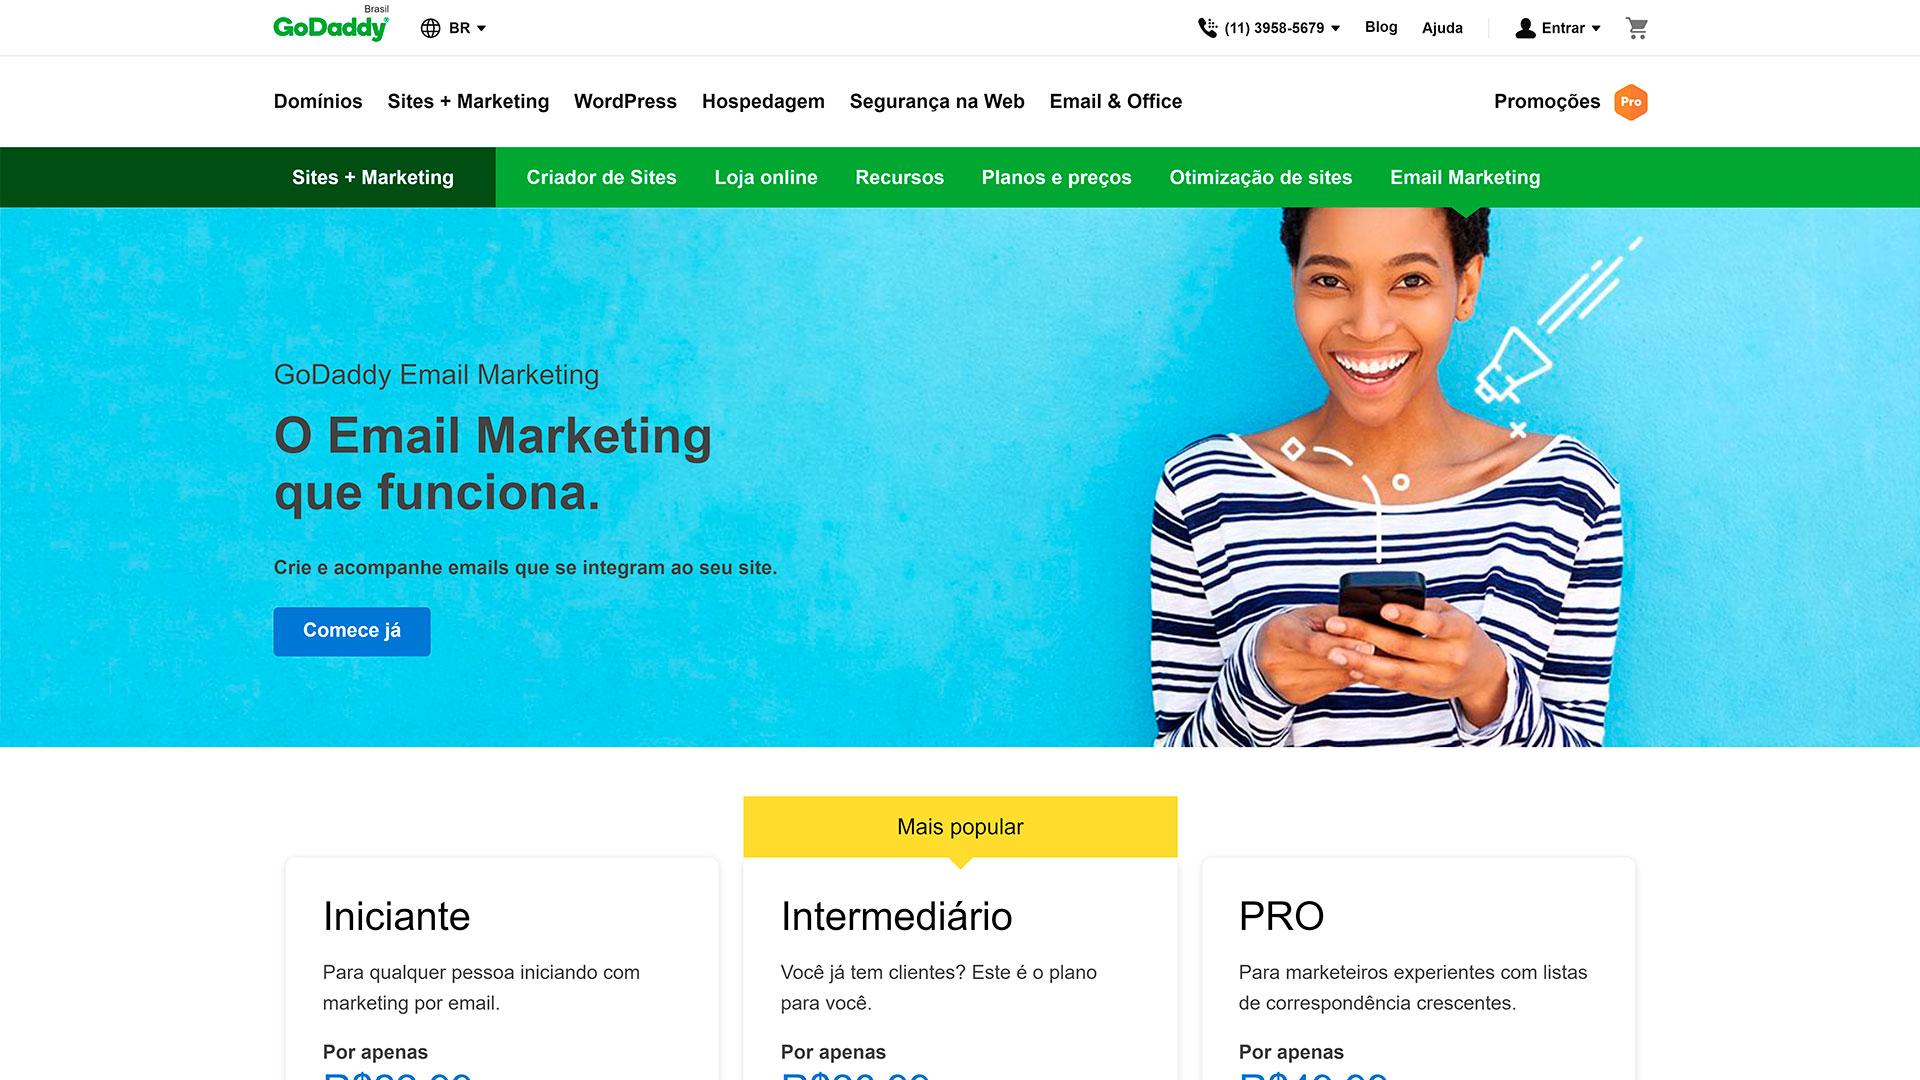 godaddy review e mail marketing